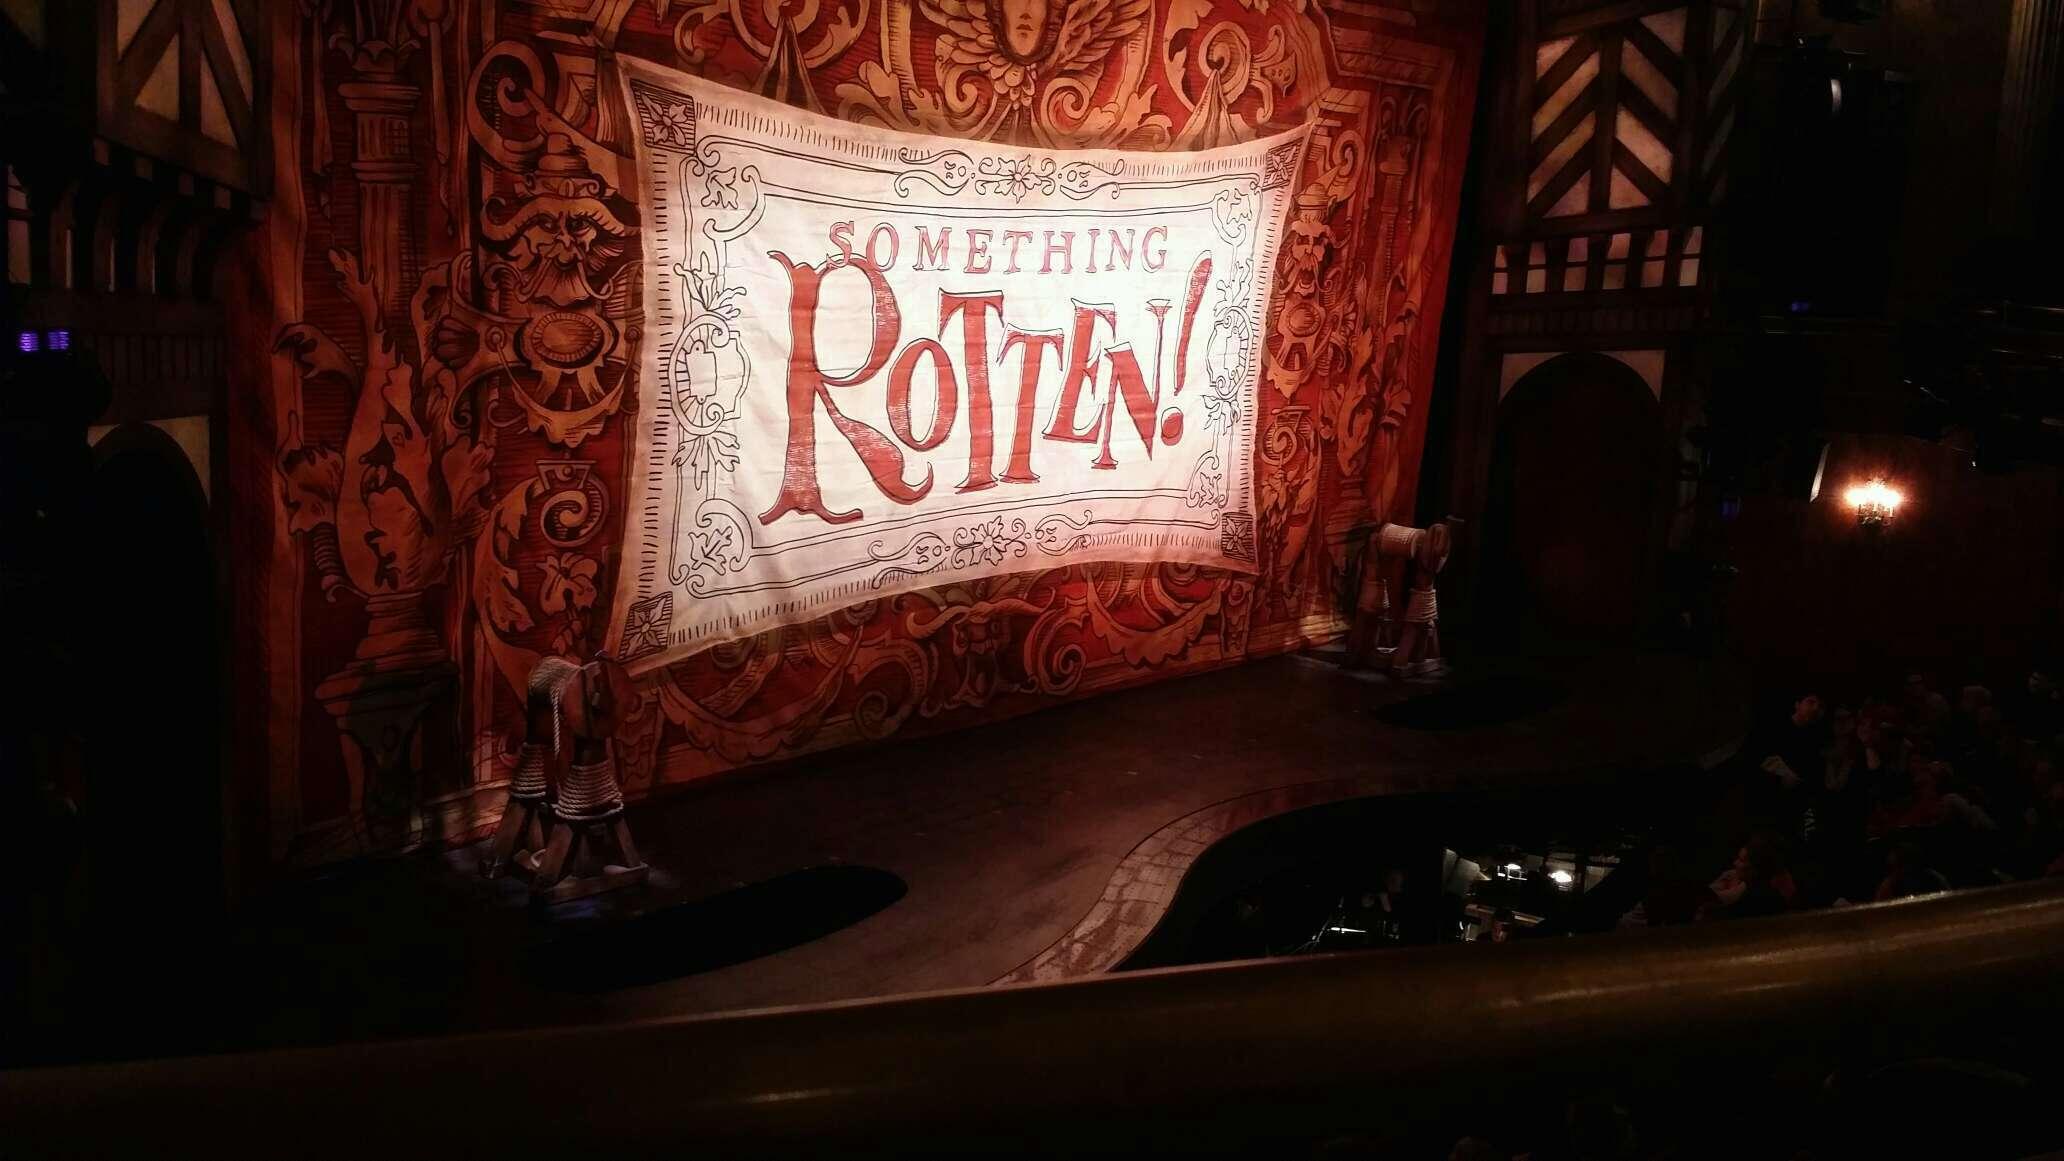 St. James Theatre Section mezzanine Row A Seat 17